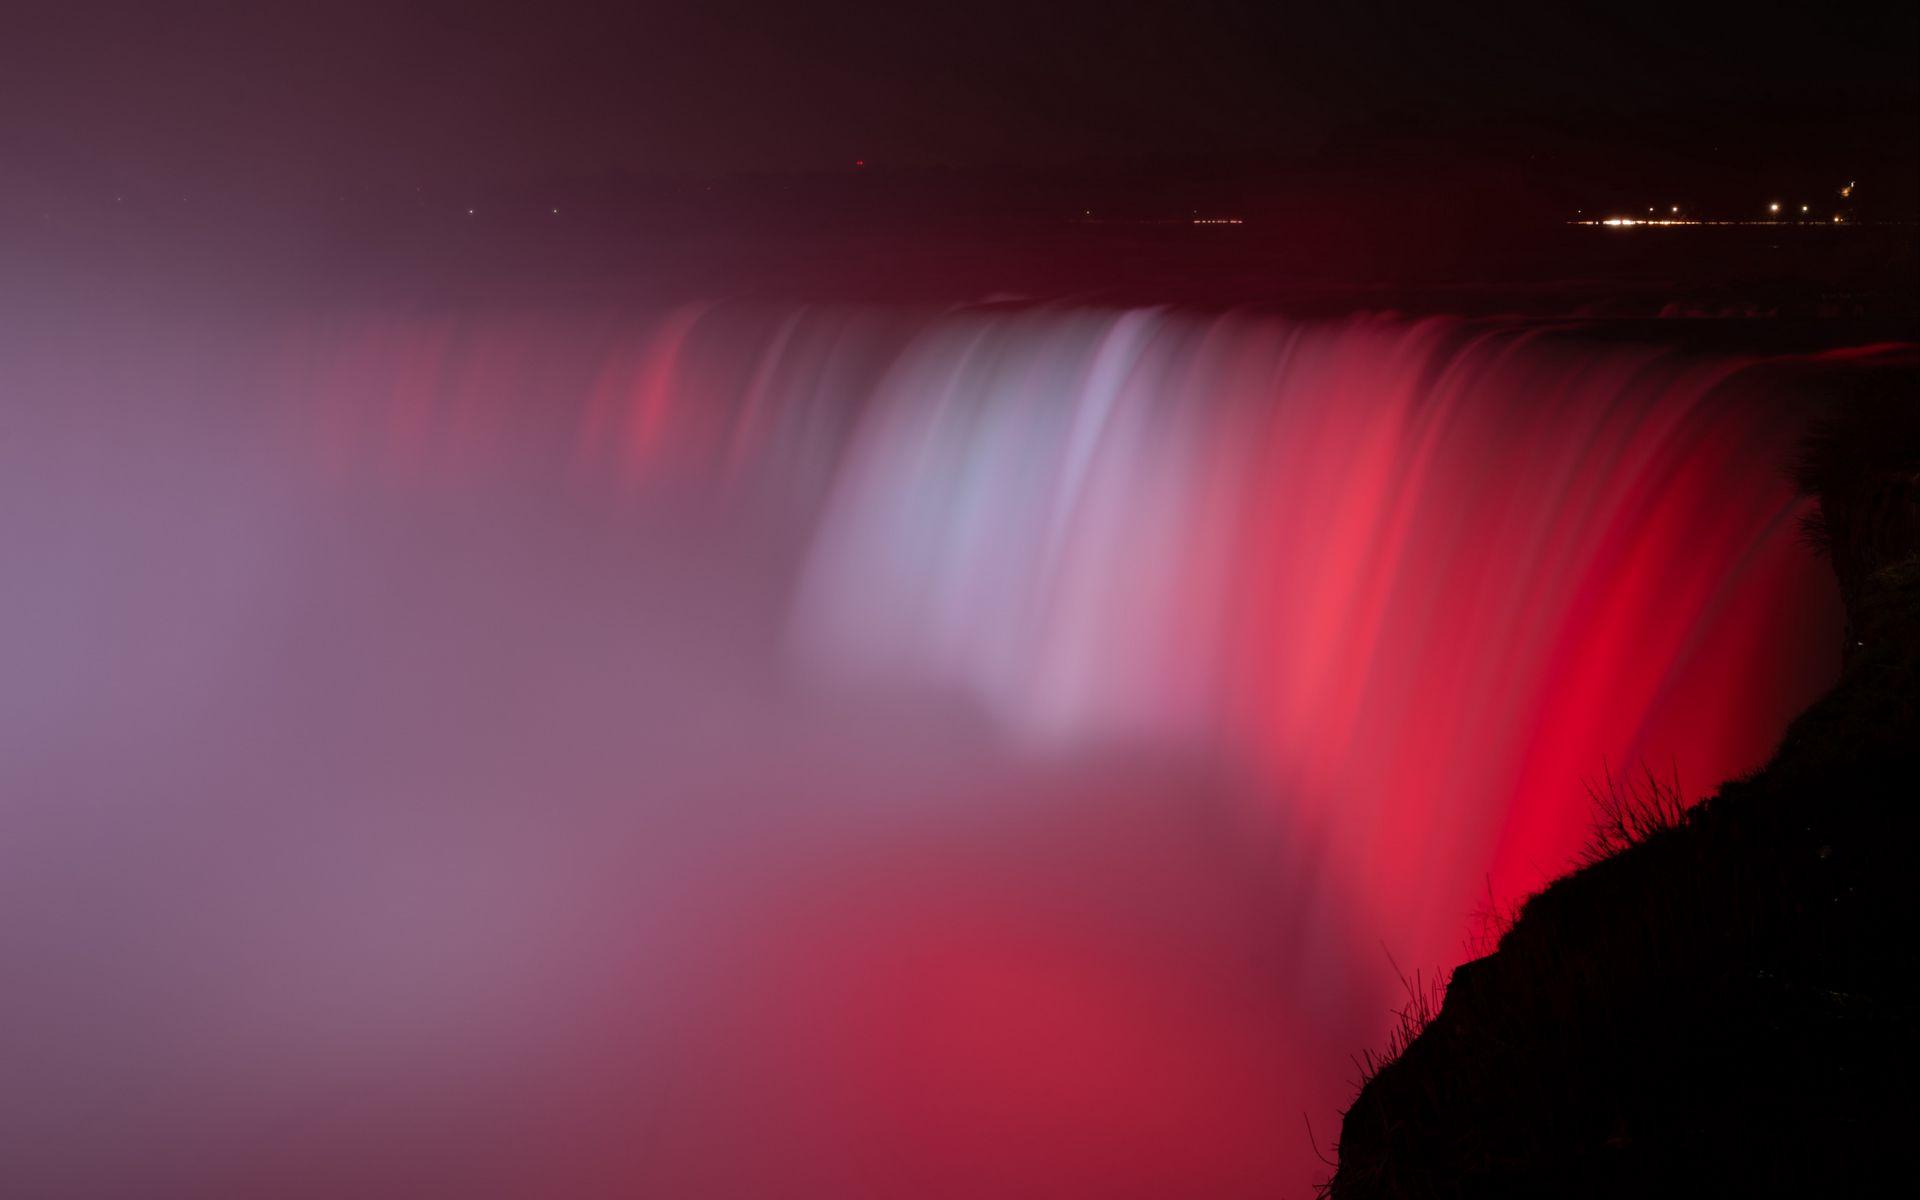 1920x1200 Wallpaper waterfall, fog, backlight, red, dark